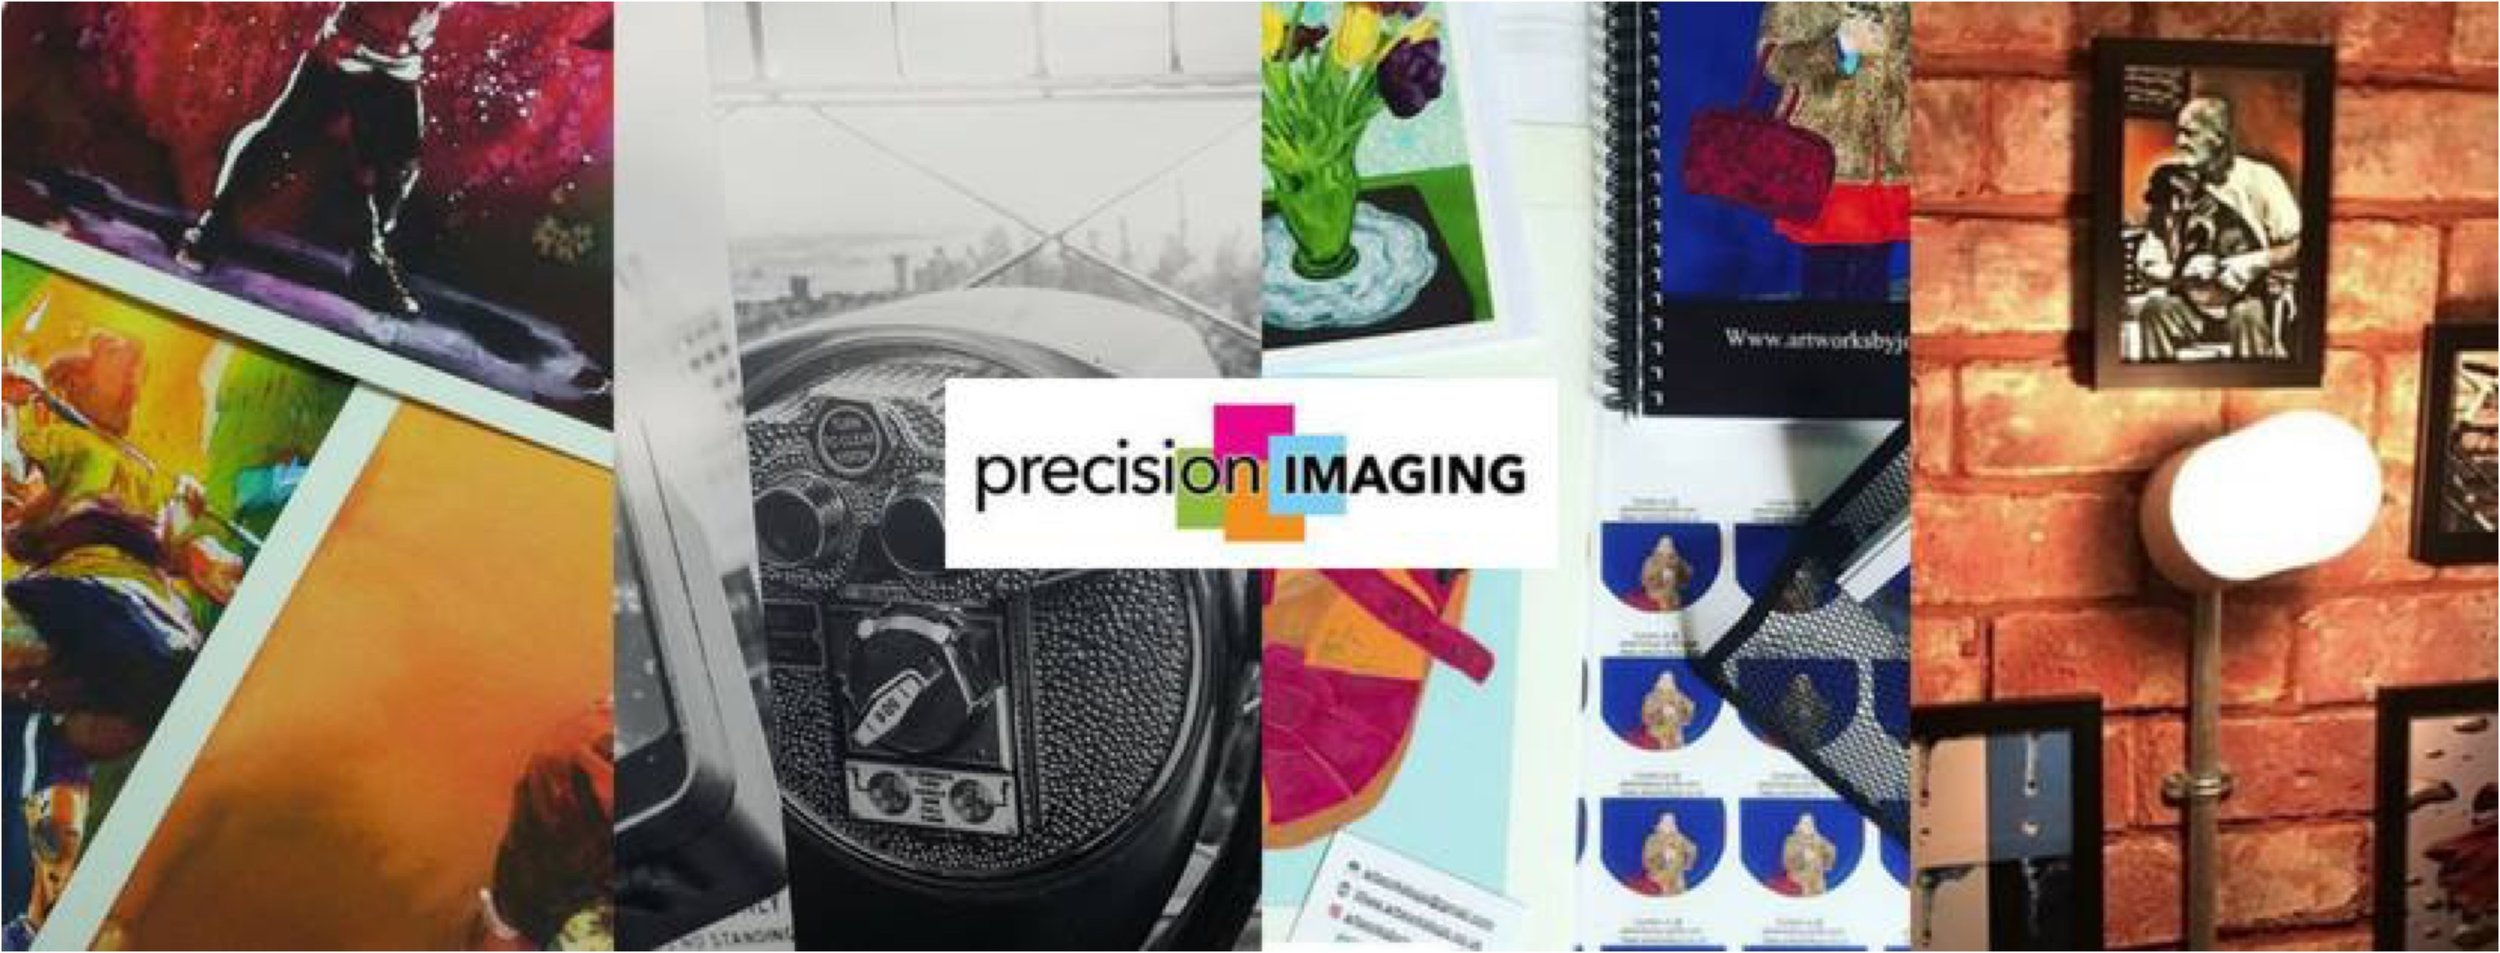 Precision2.jpg